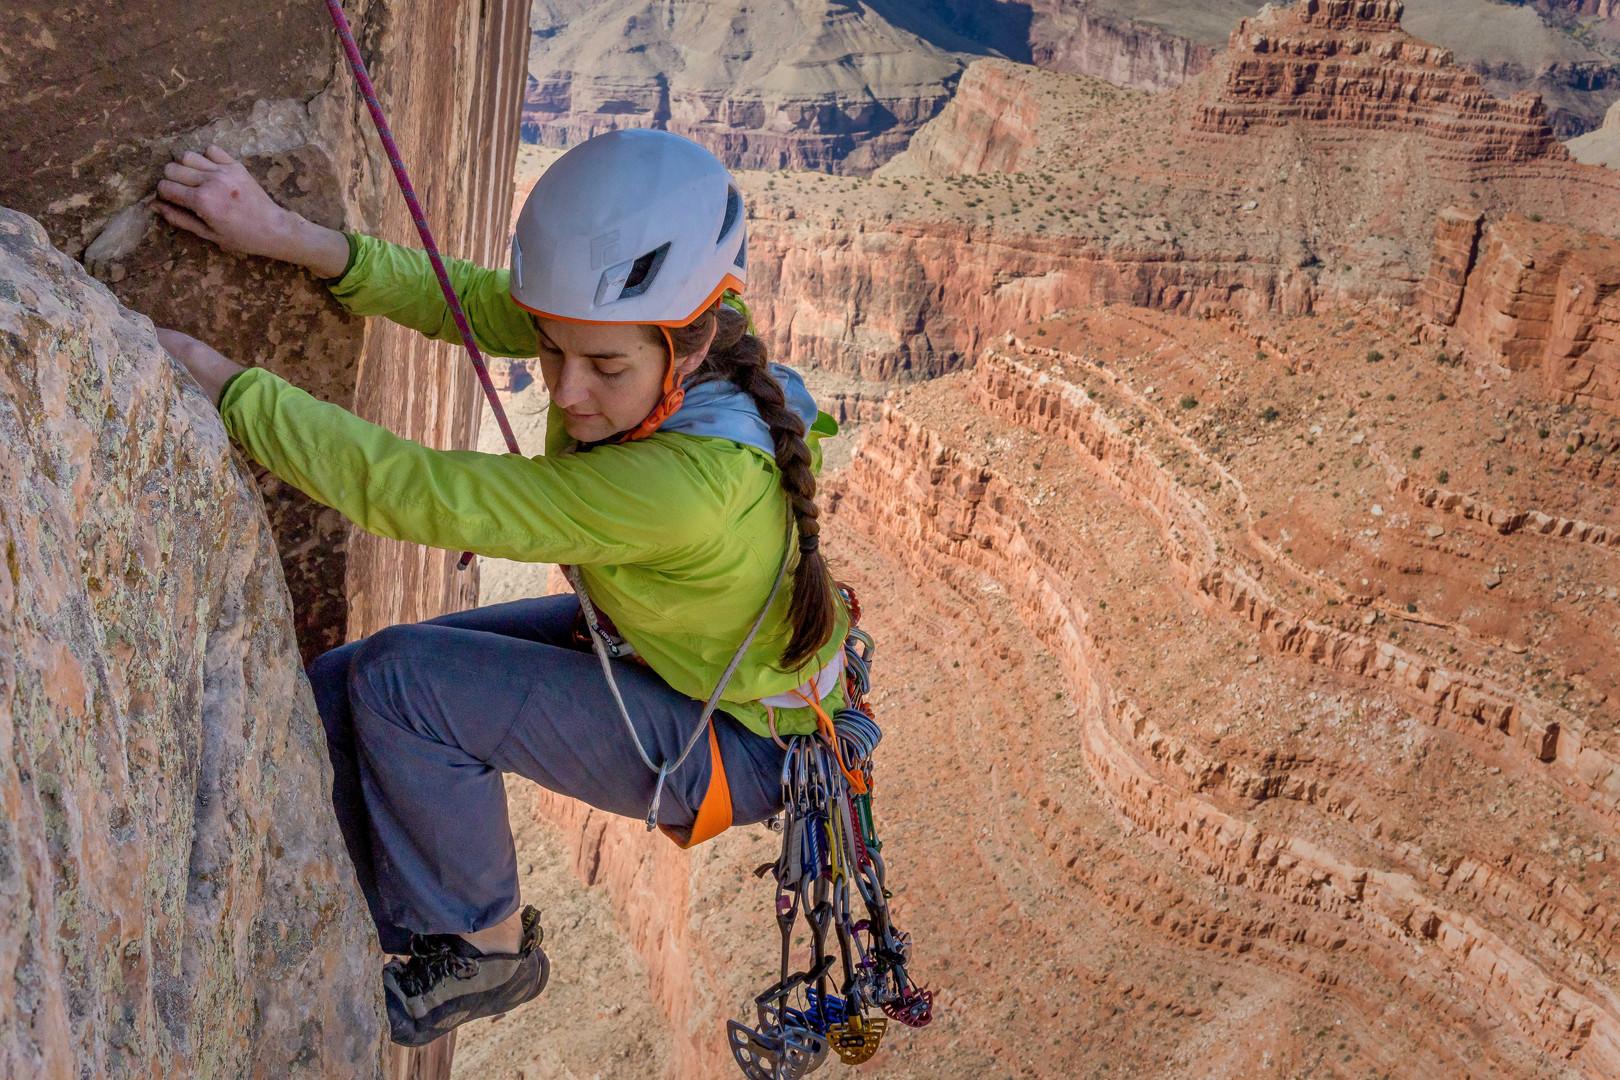 Kate McHugh nearing the summit of Zoroaster Temple